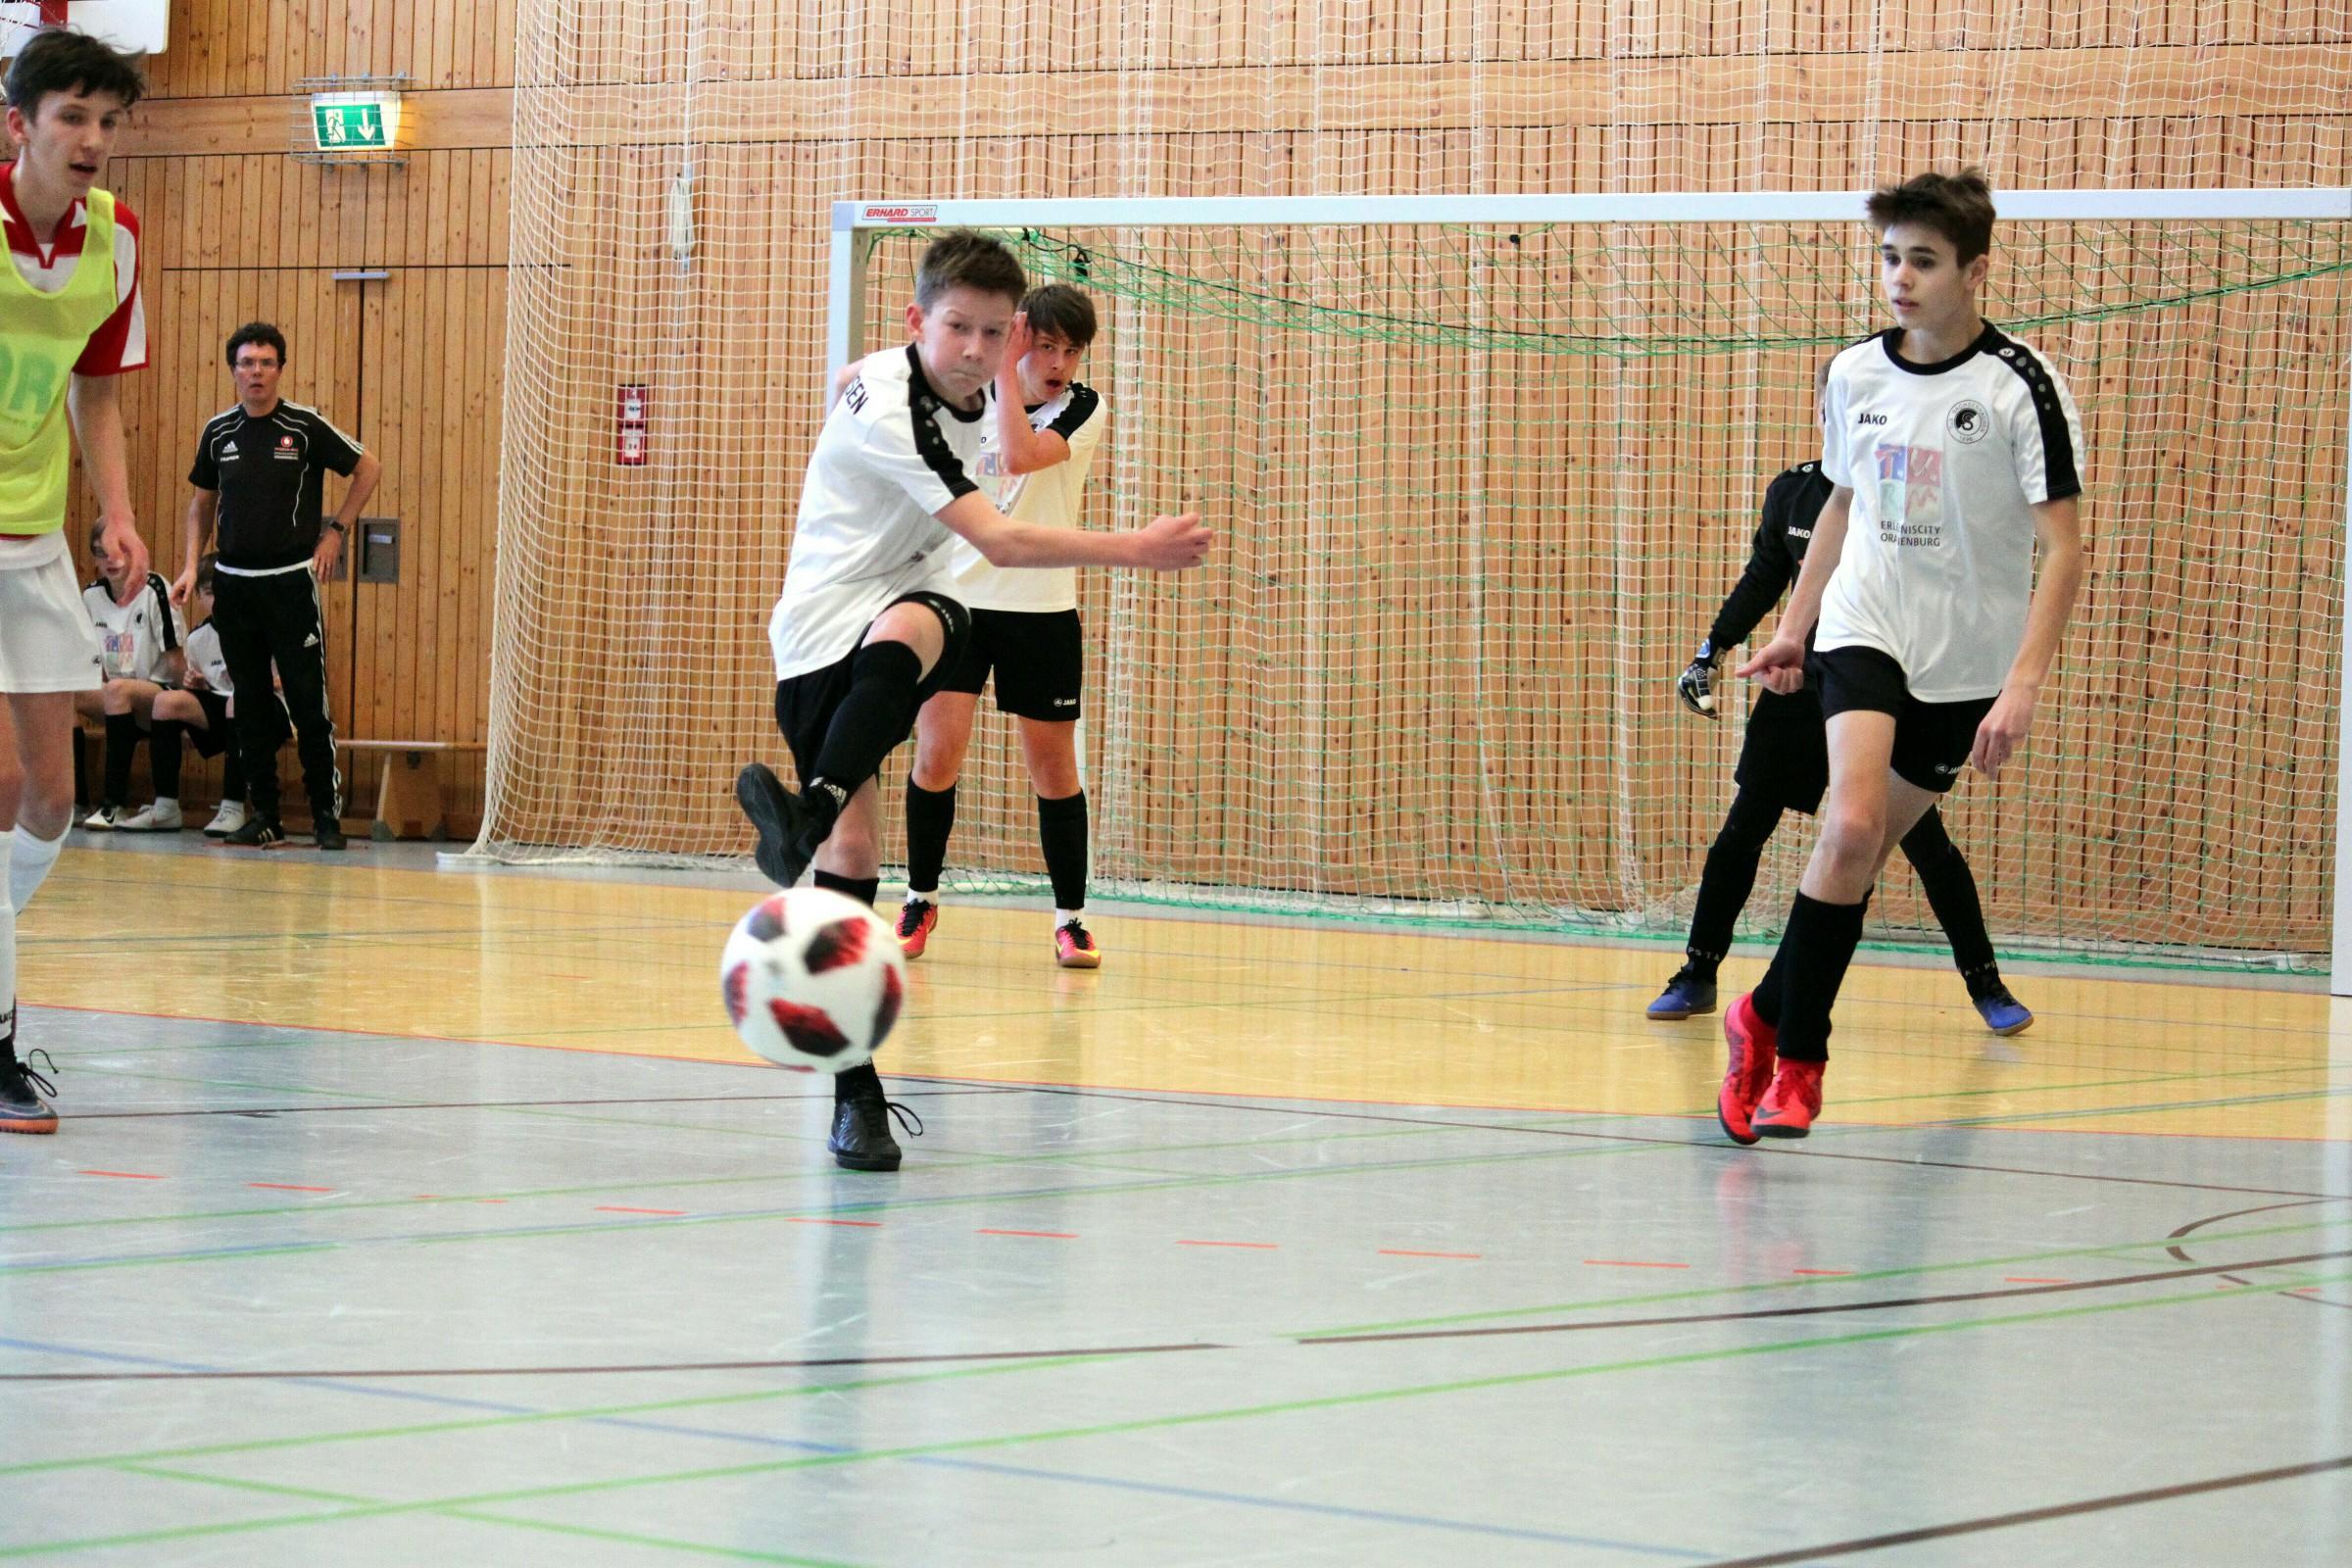 20190217 3. Wandlitzer Hallen-Cup der C-Junioren  (6)